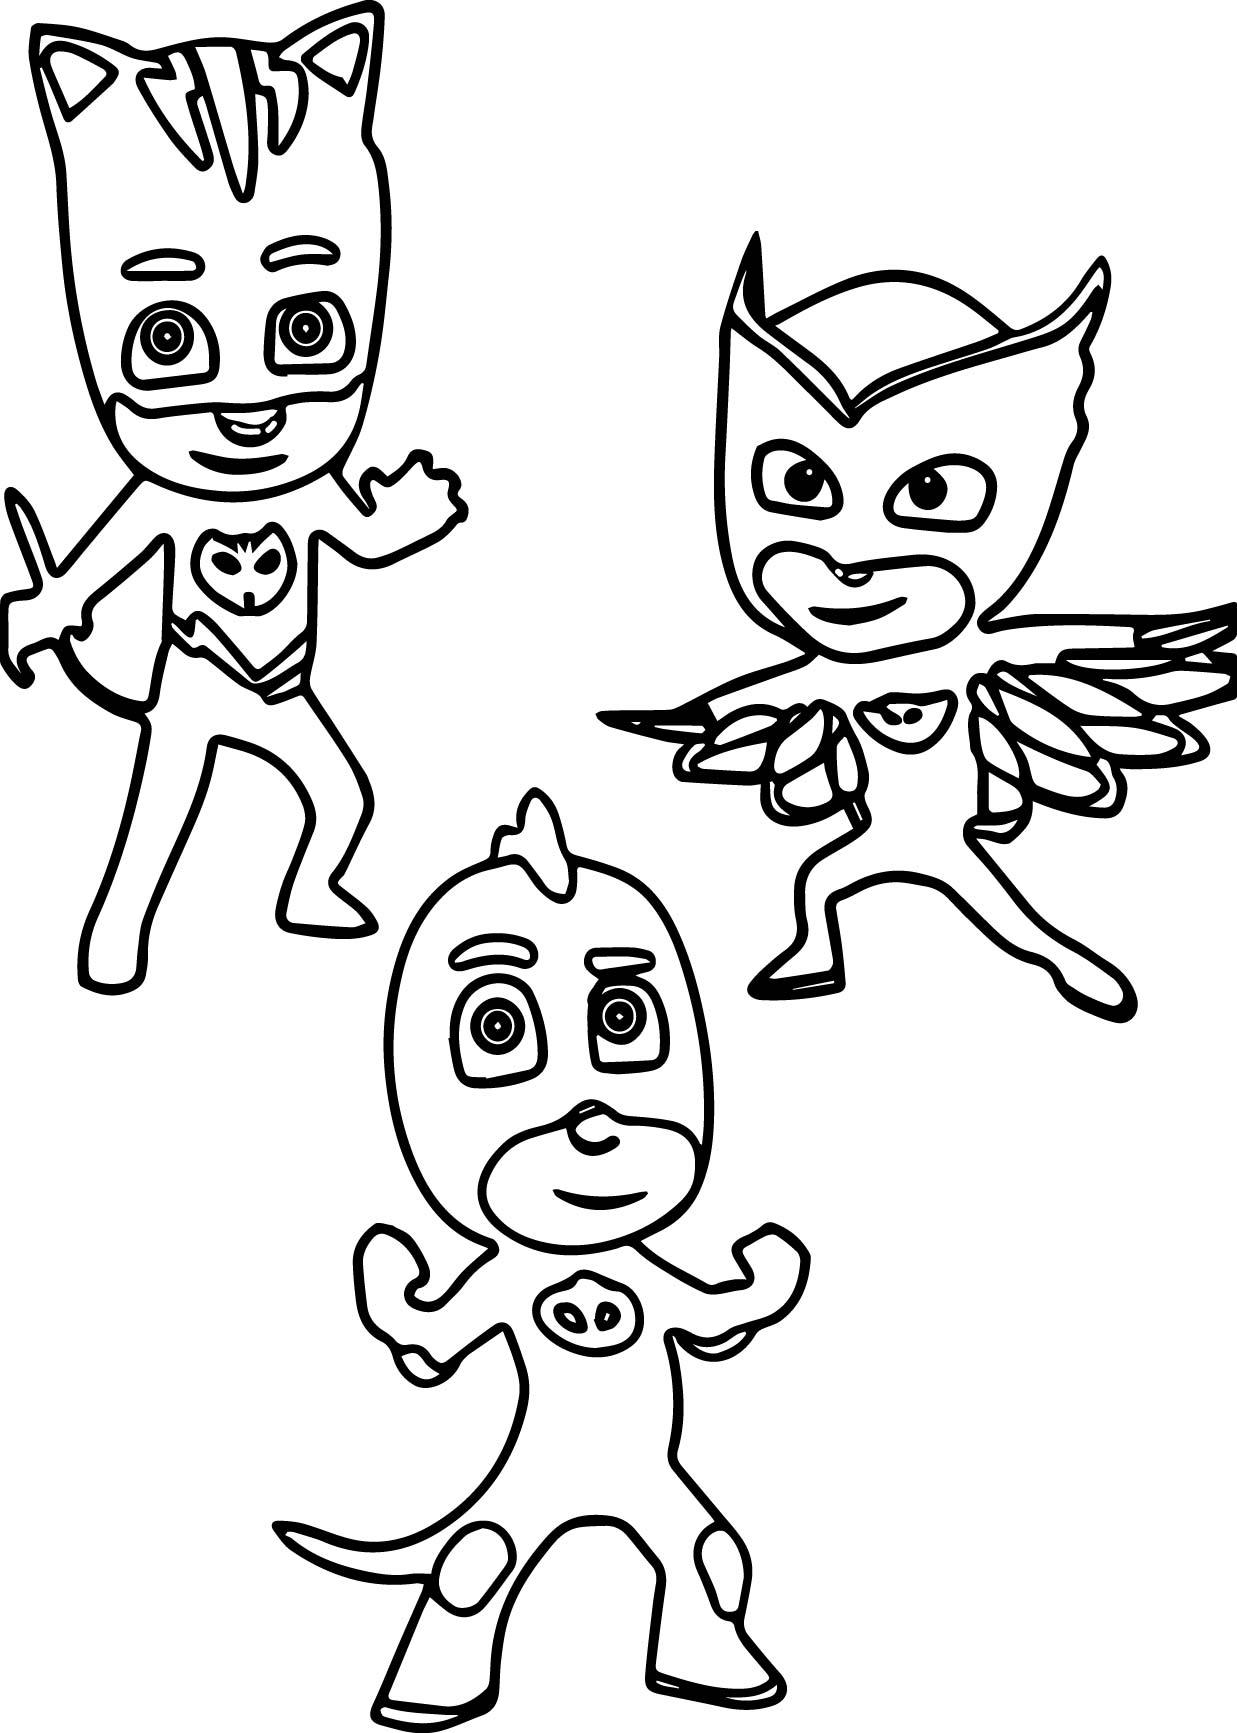 Pj Masks Printable Coloring Page